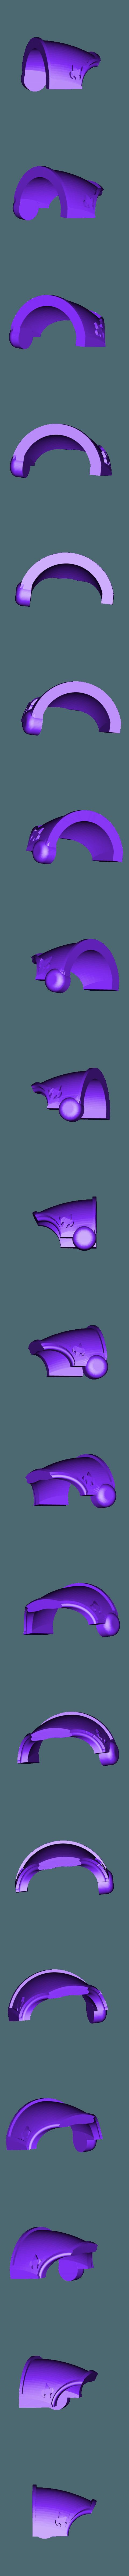 Shoulder_Right_repaired.stl Download free STL file 1000 Followers! 3rd Legion - FireBird Terminators • 3D printing model, ThatEvilOne